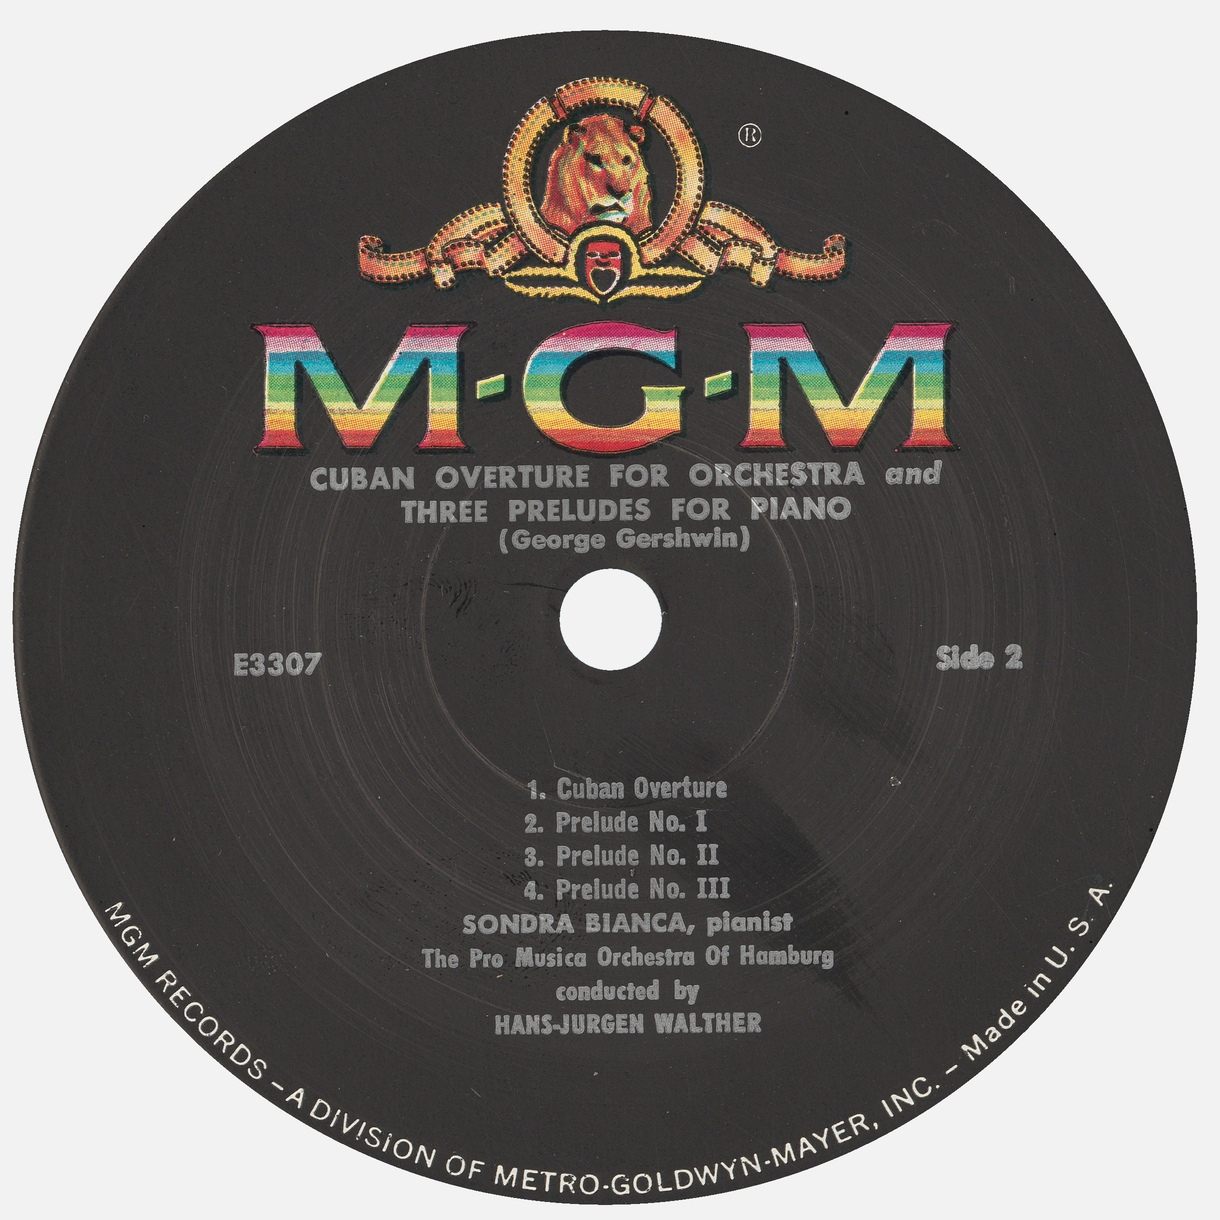 Étiquette verso du disque Metro Goldwyn Mayer MGM 3307